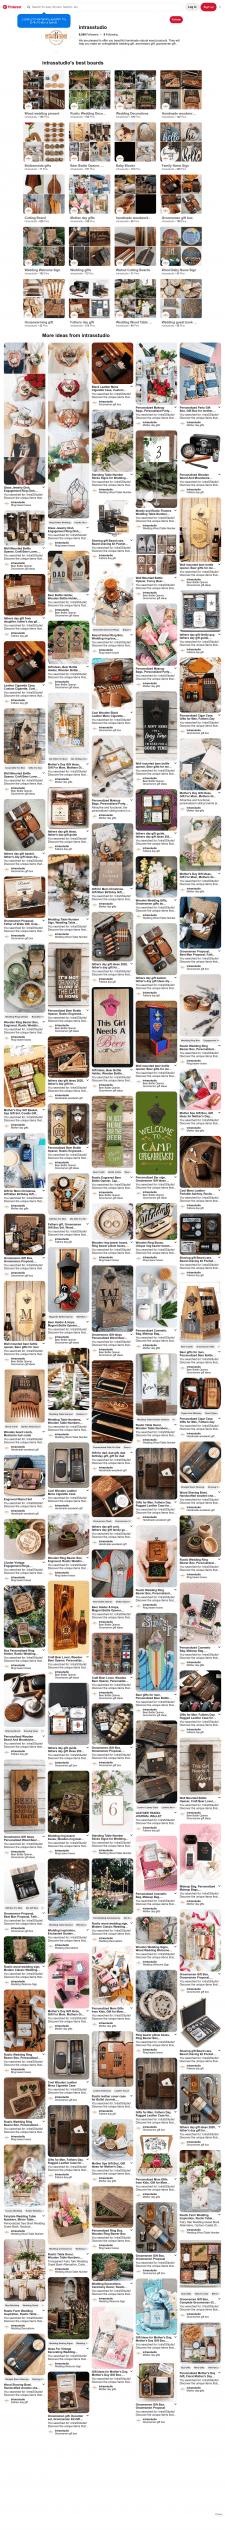 Handmade natural wood products